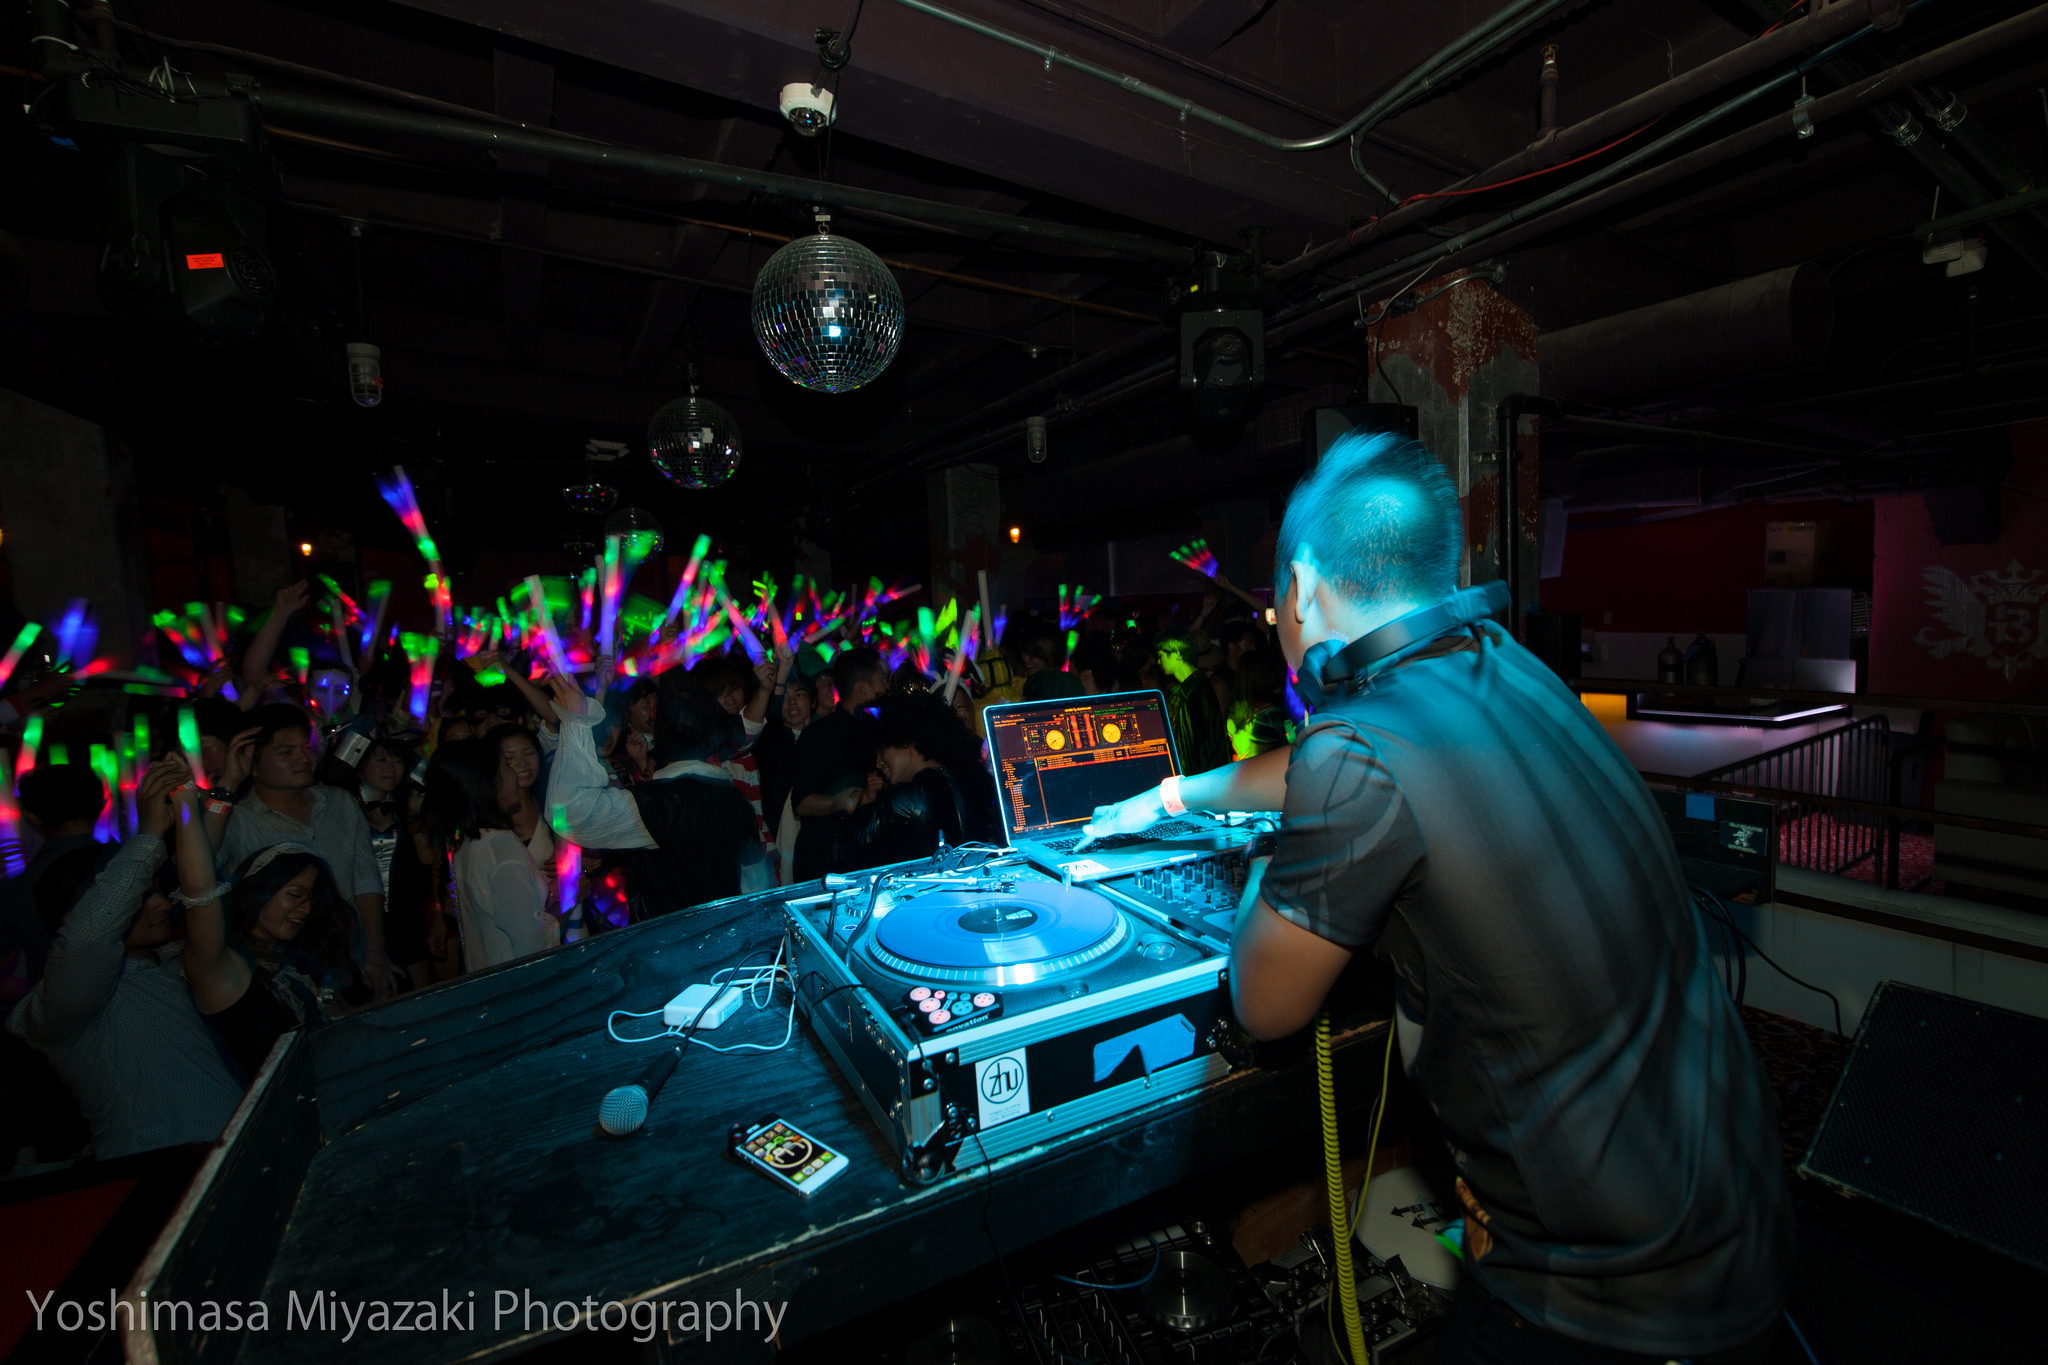 DJ MOJOE Performing at Belasco Theater Club in DTLA